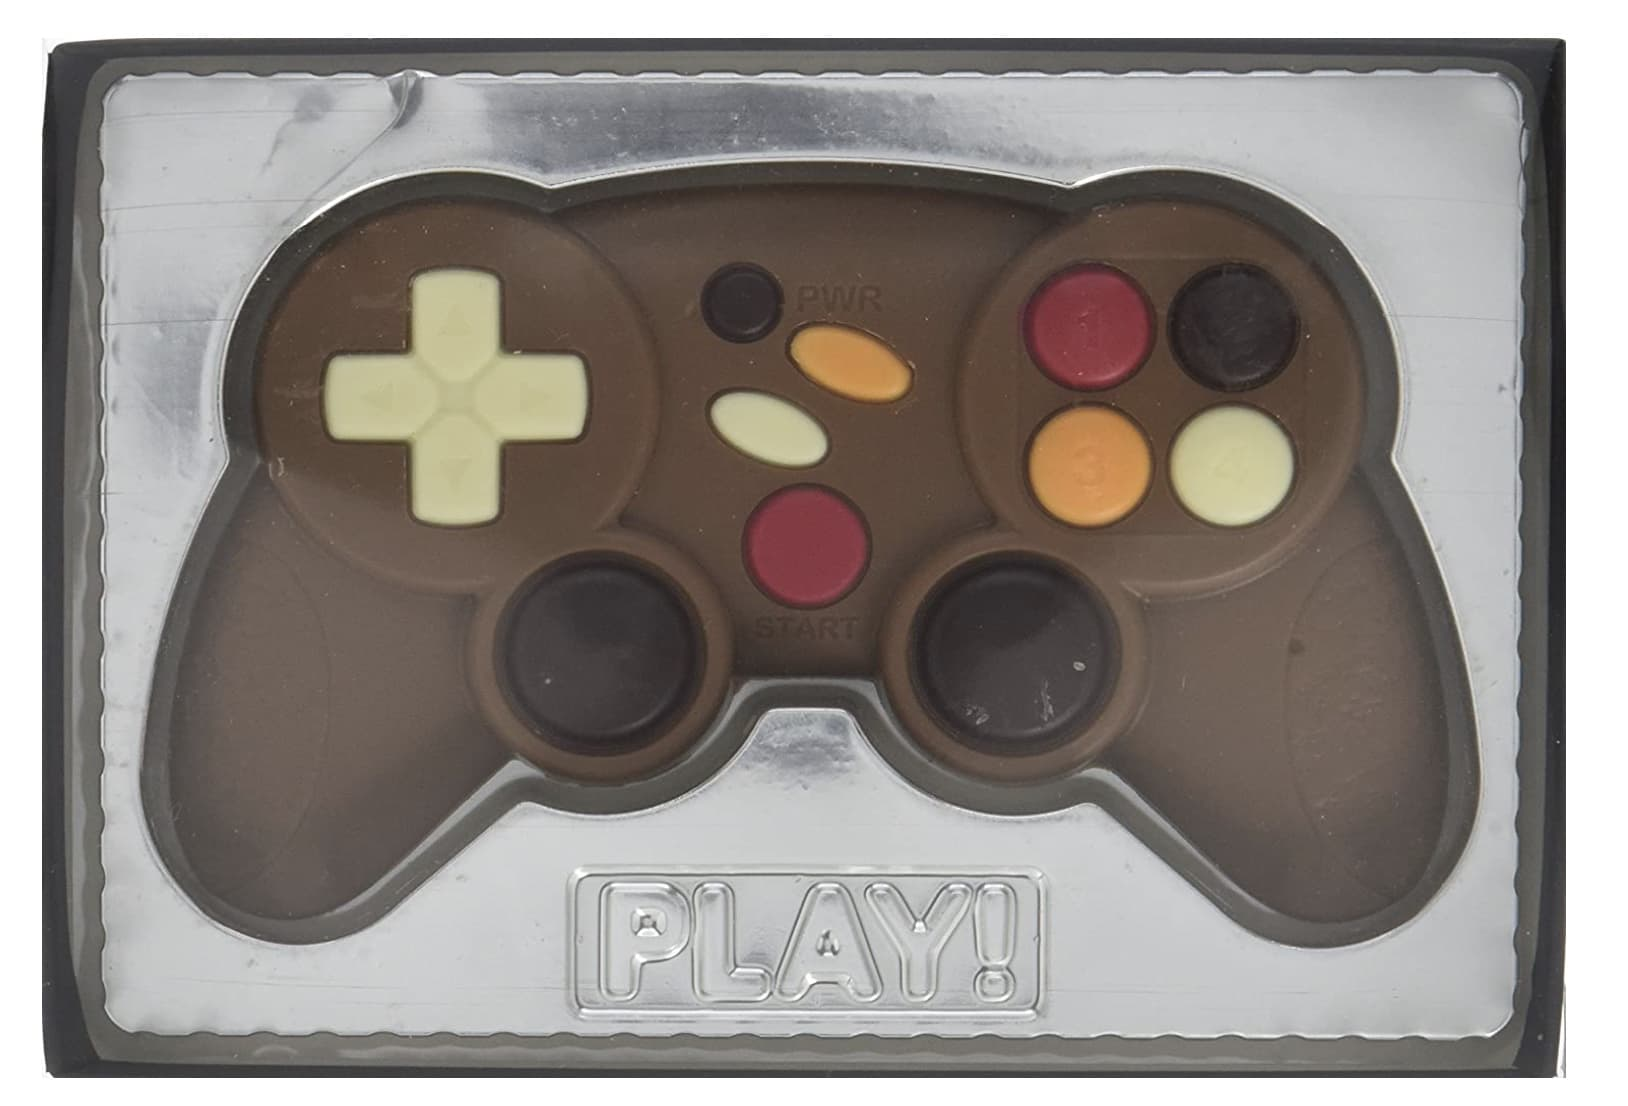 Schokolade Geschenk Game Controller